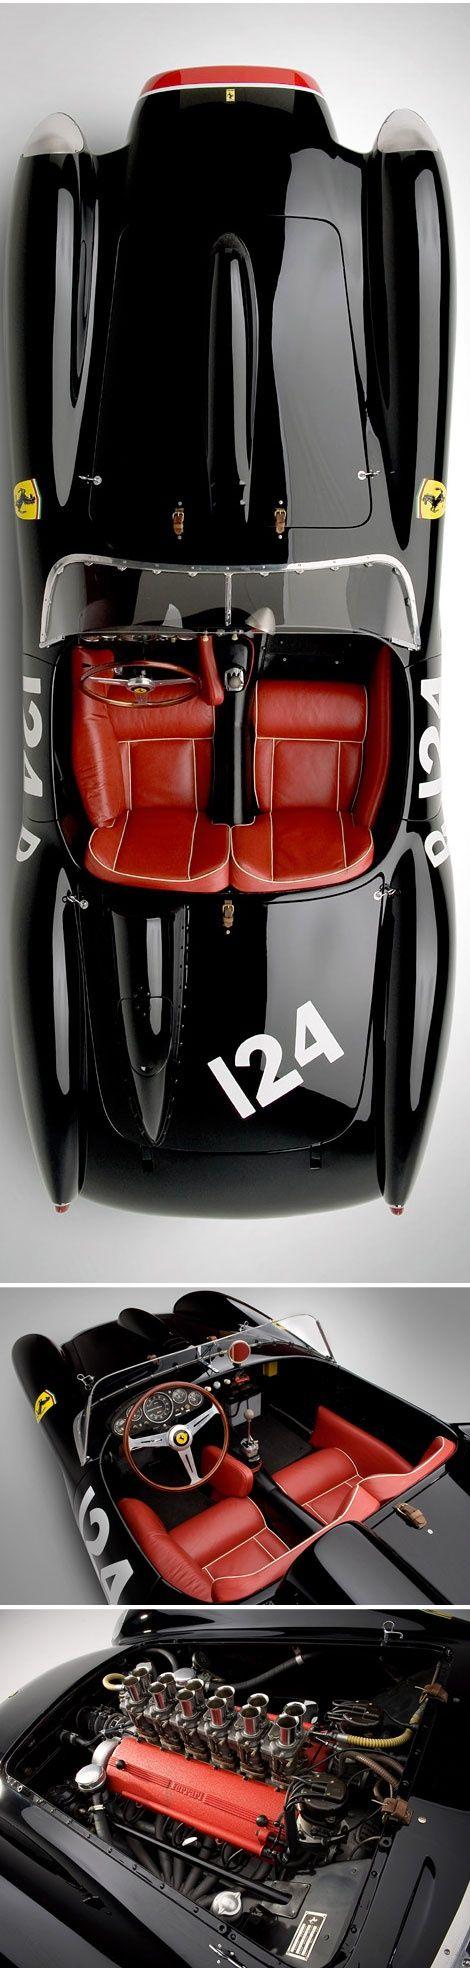 The beautiful #Ferrari 250 TR. One of the classic cool #sportcars found in #eBayGarage.